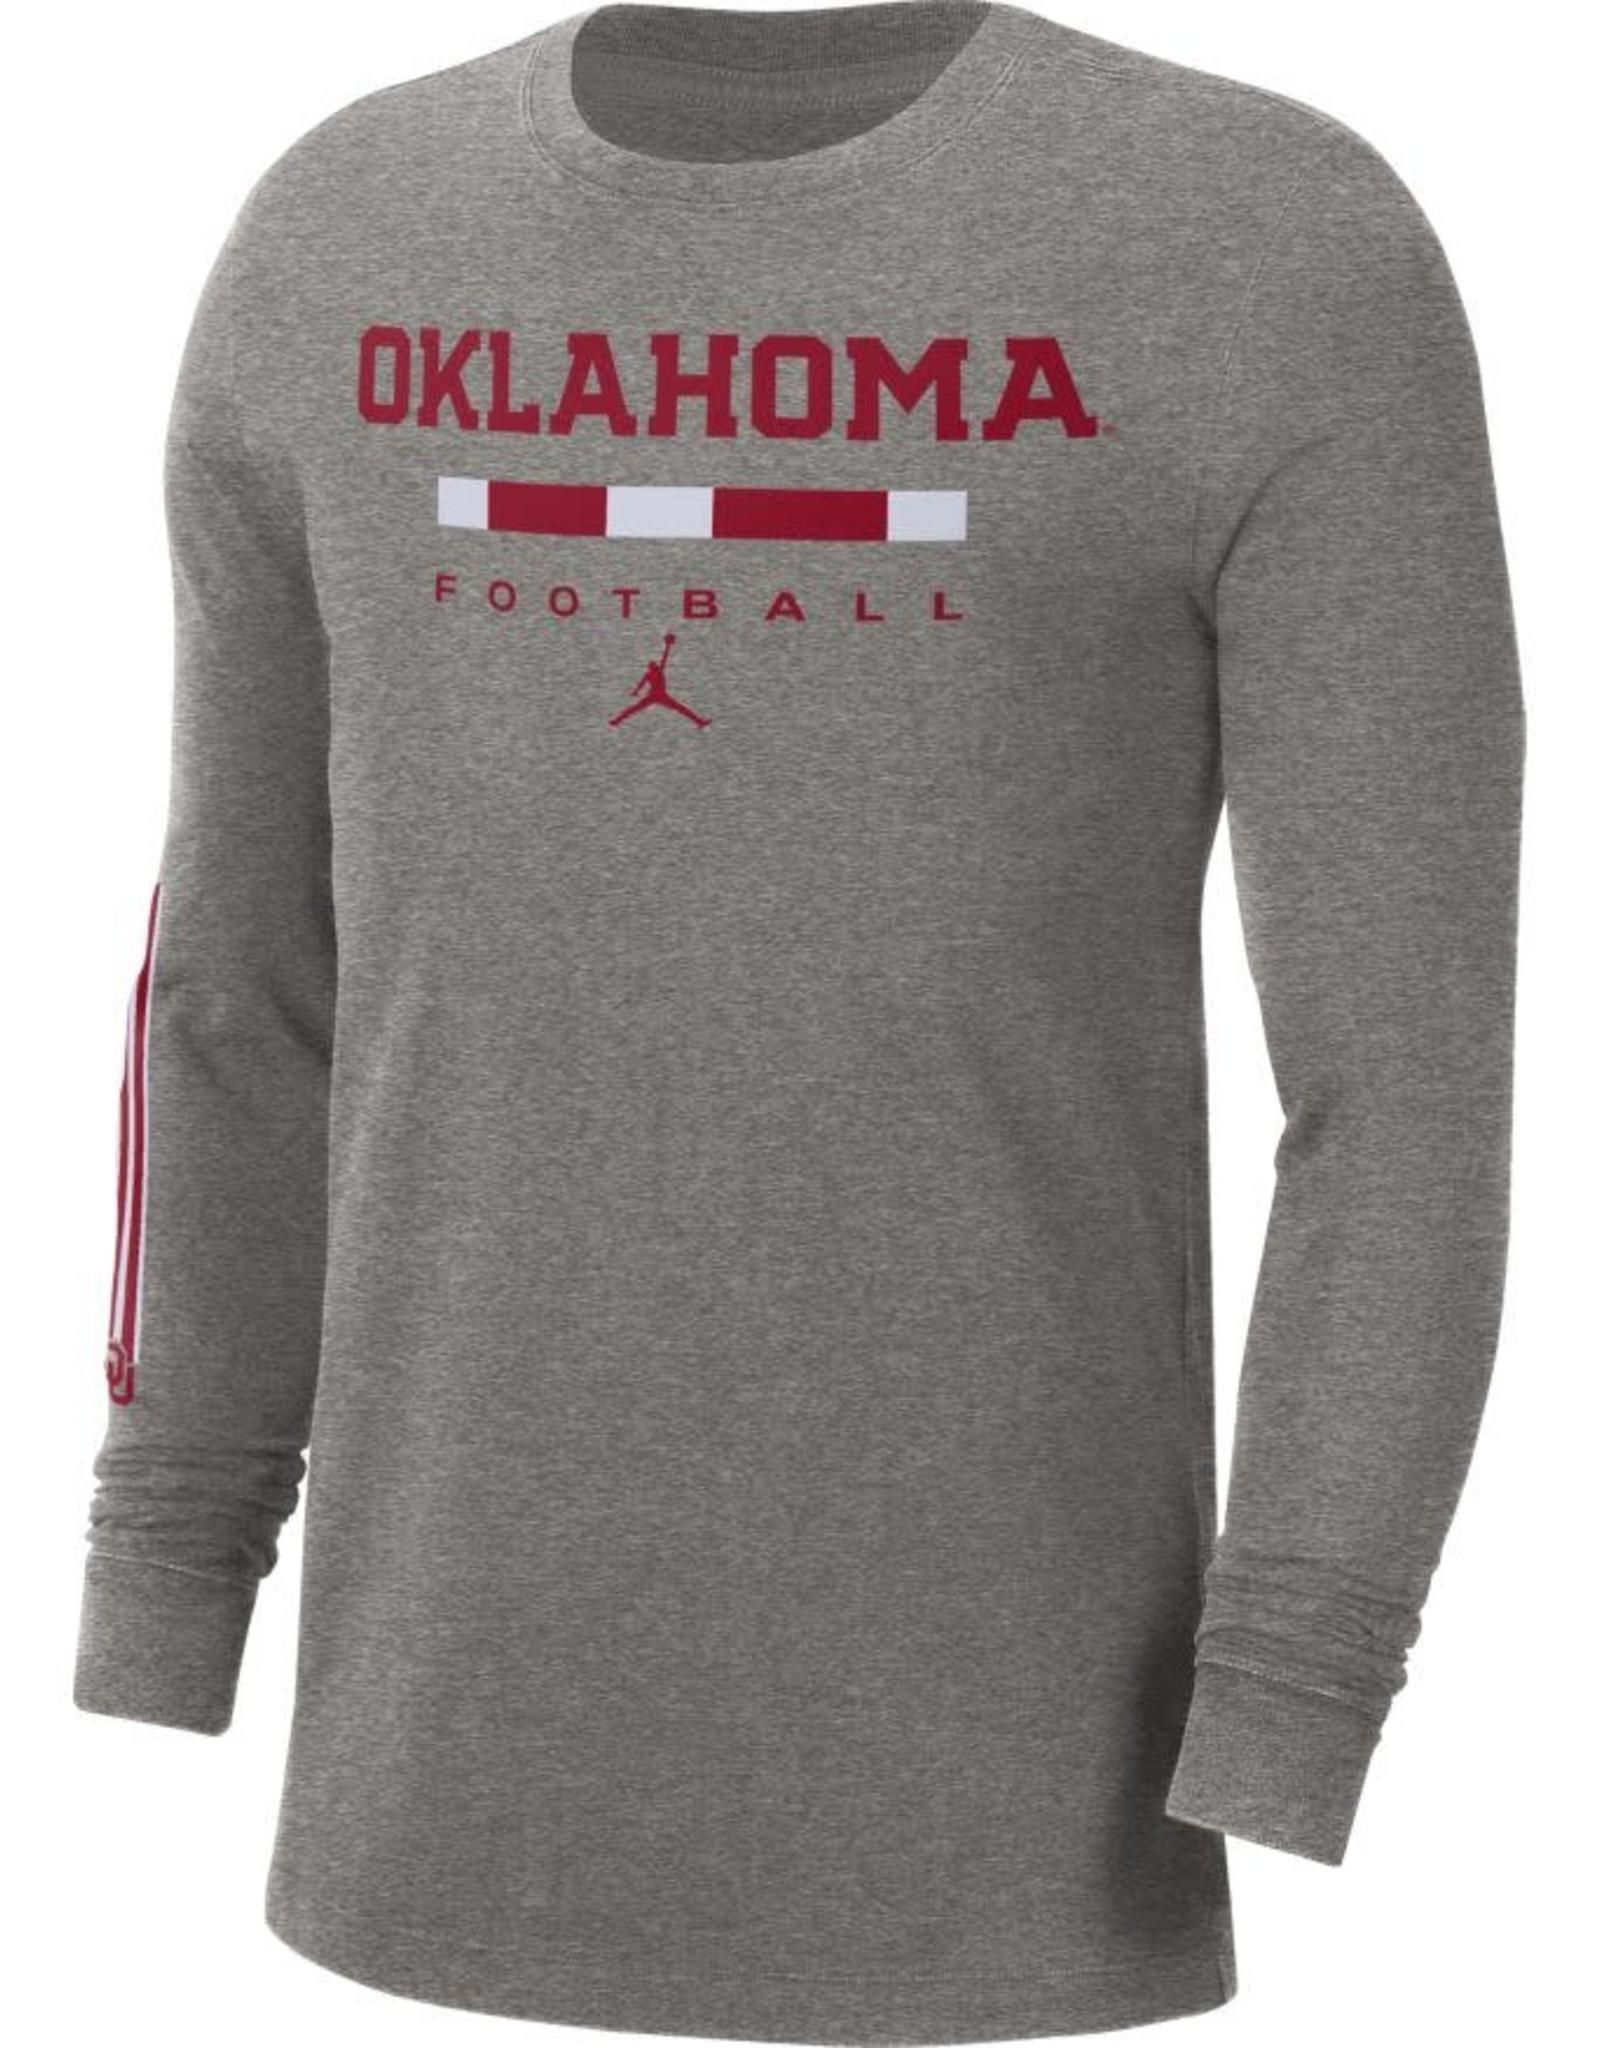 Jordan Men's Jordan Gray Oklahoma Football L/S Cotton Word Tee